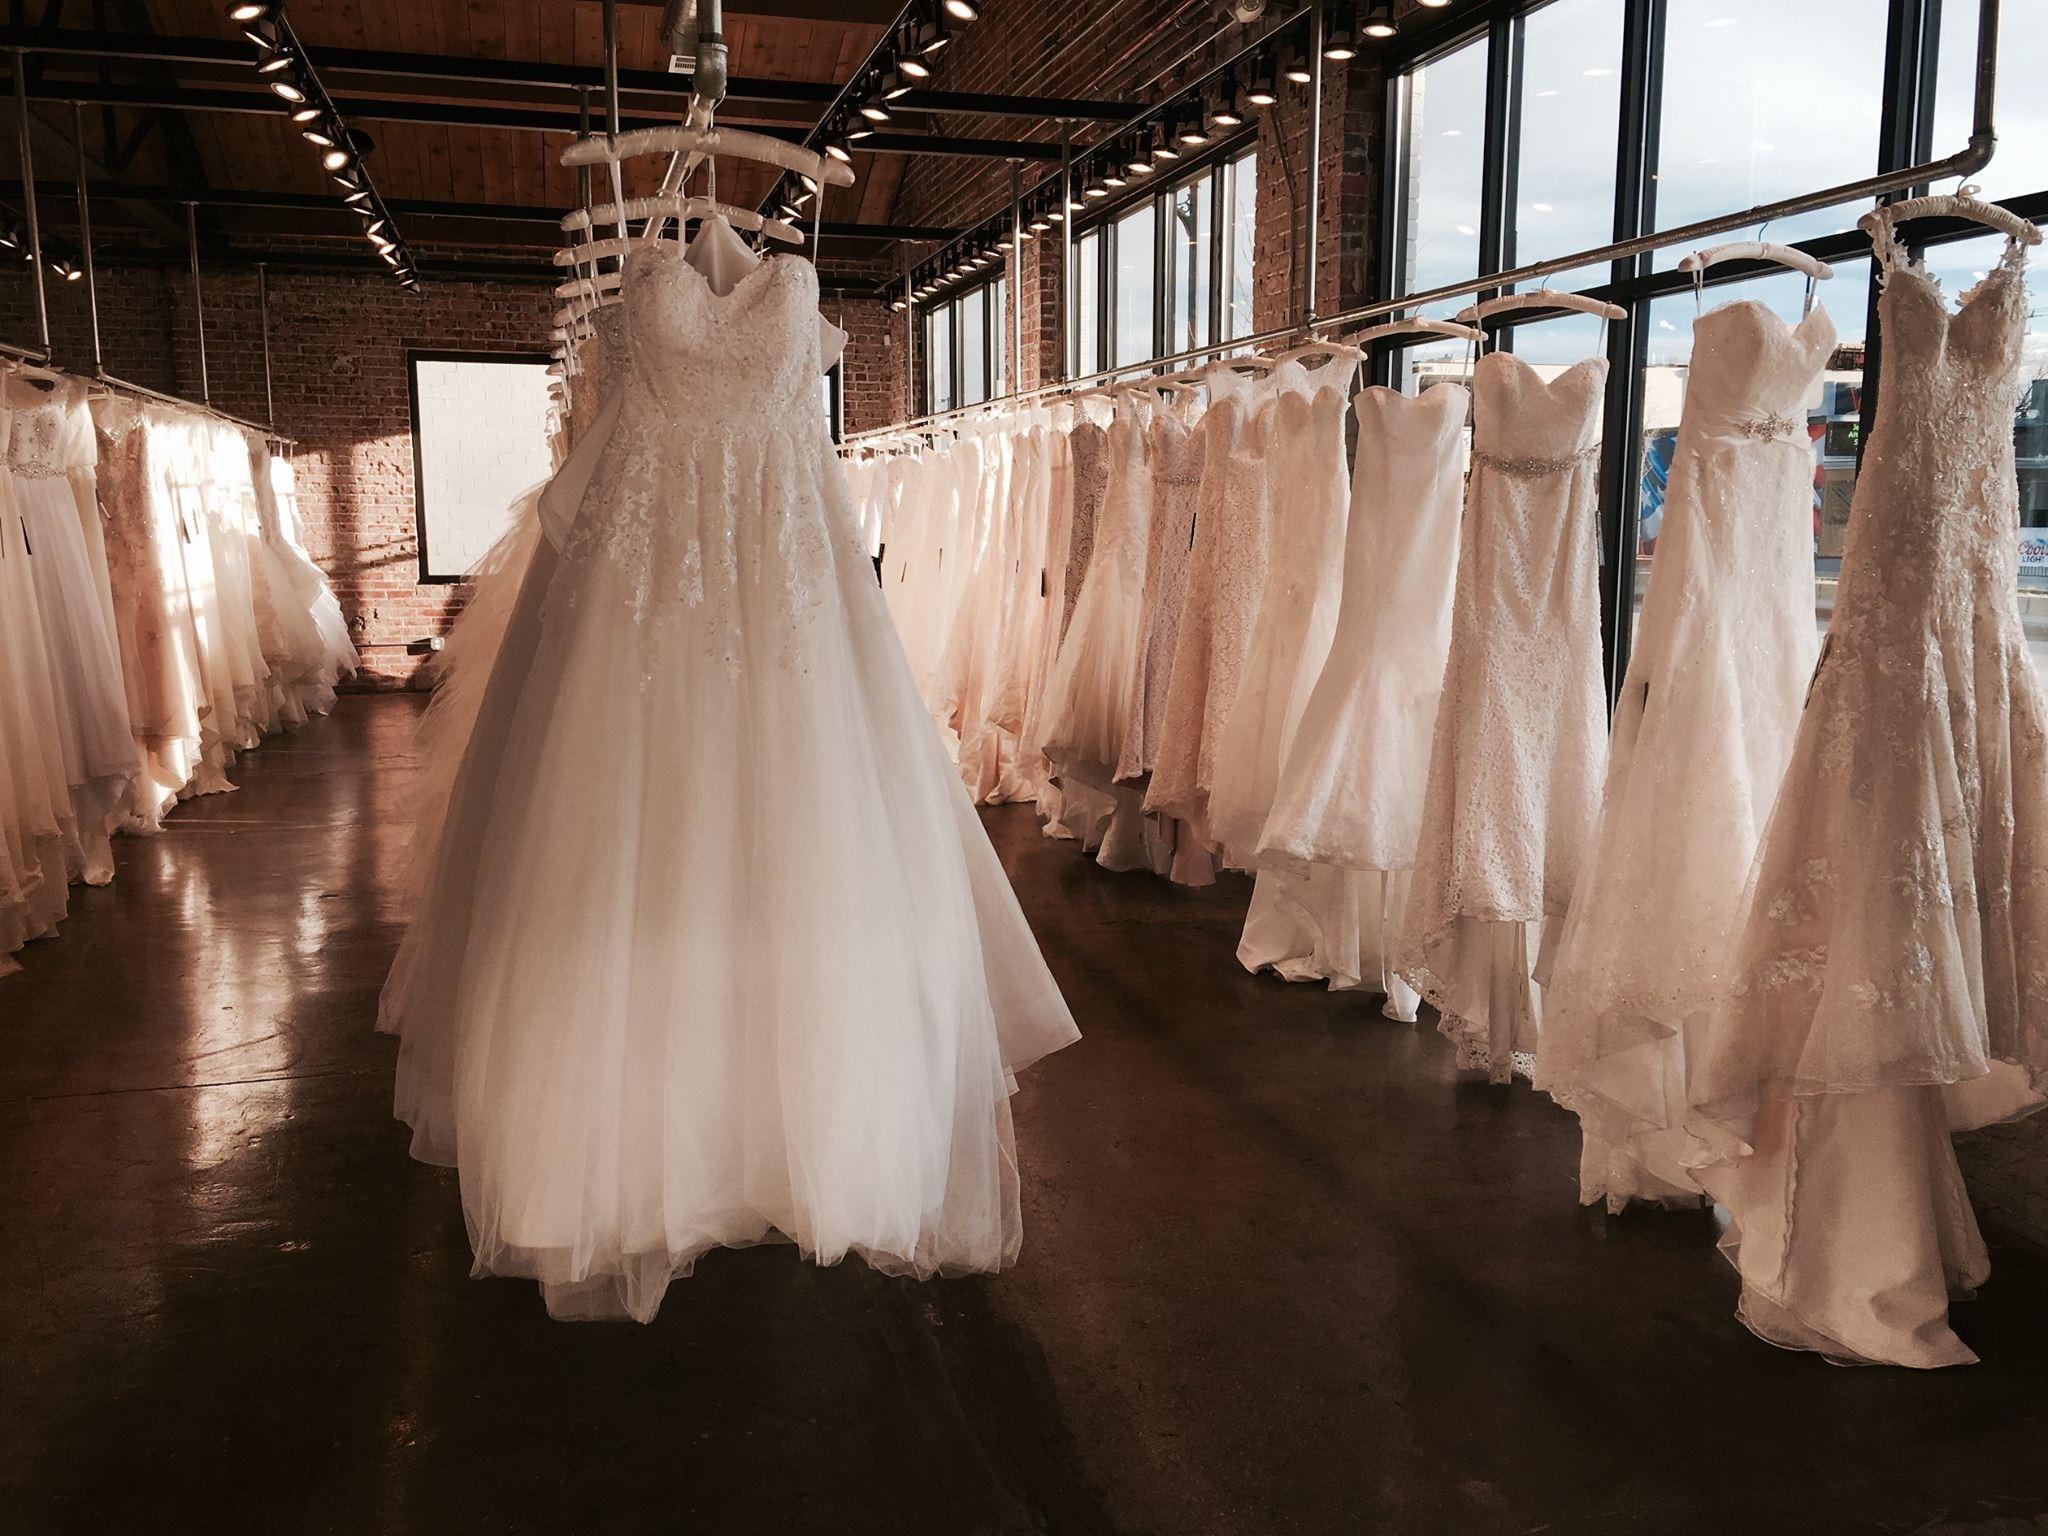 Wedding gowns in denver co bridesmaid dresses for Wedding dresses denver area